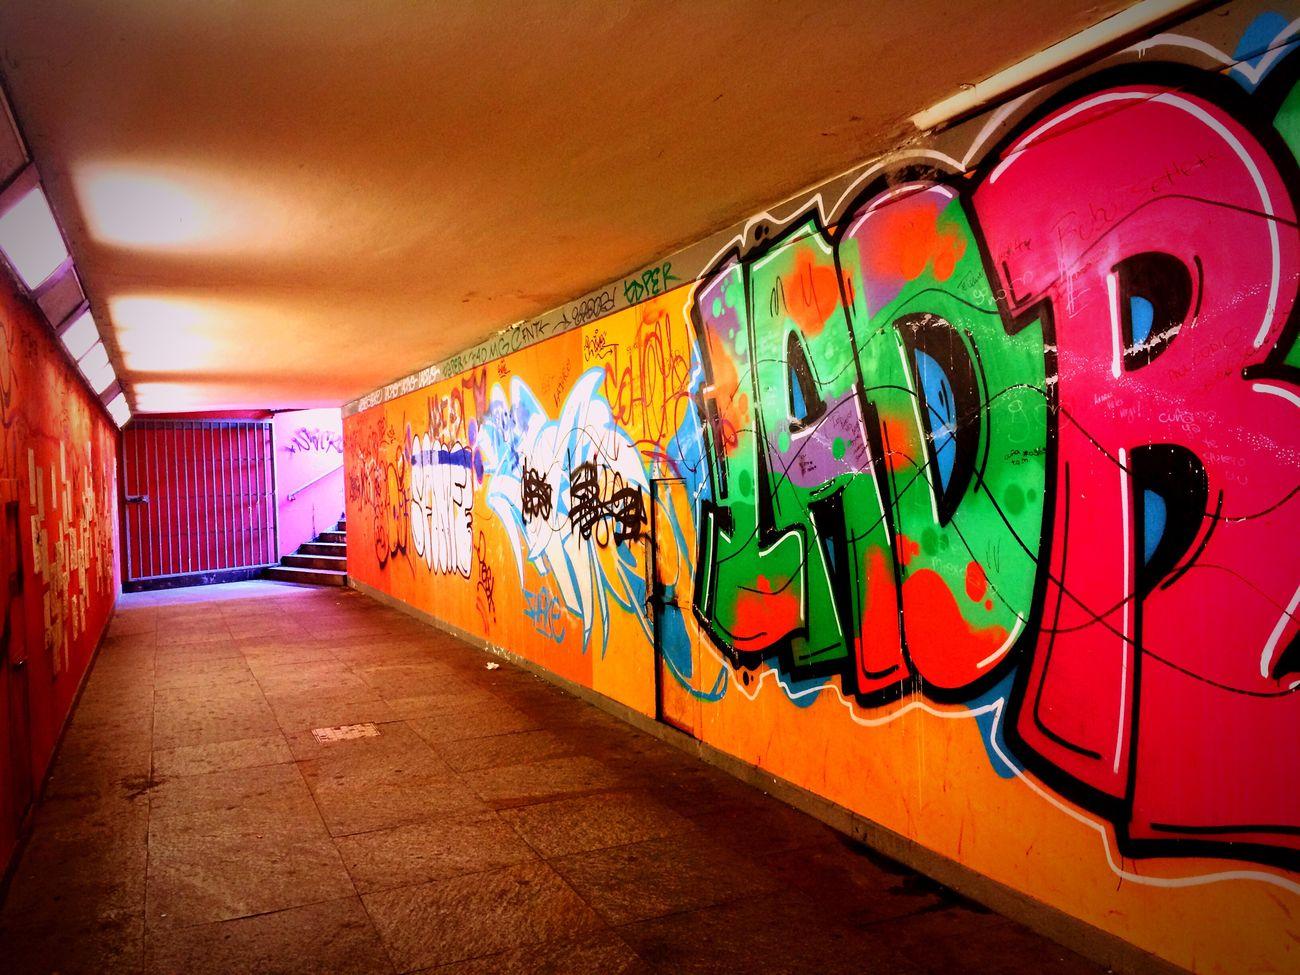 Multi Colored Tunnel Murales Illuminated Art ArtWork Writing Followme Like4like Likeforlike Tagsforlikes I'm In Love Day City